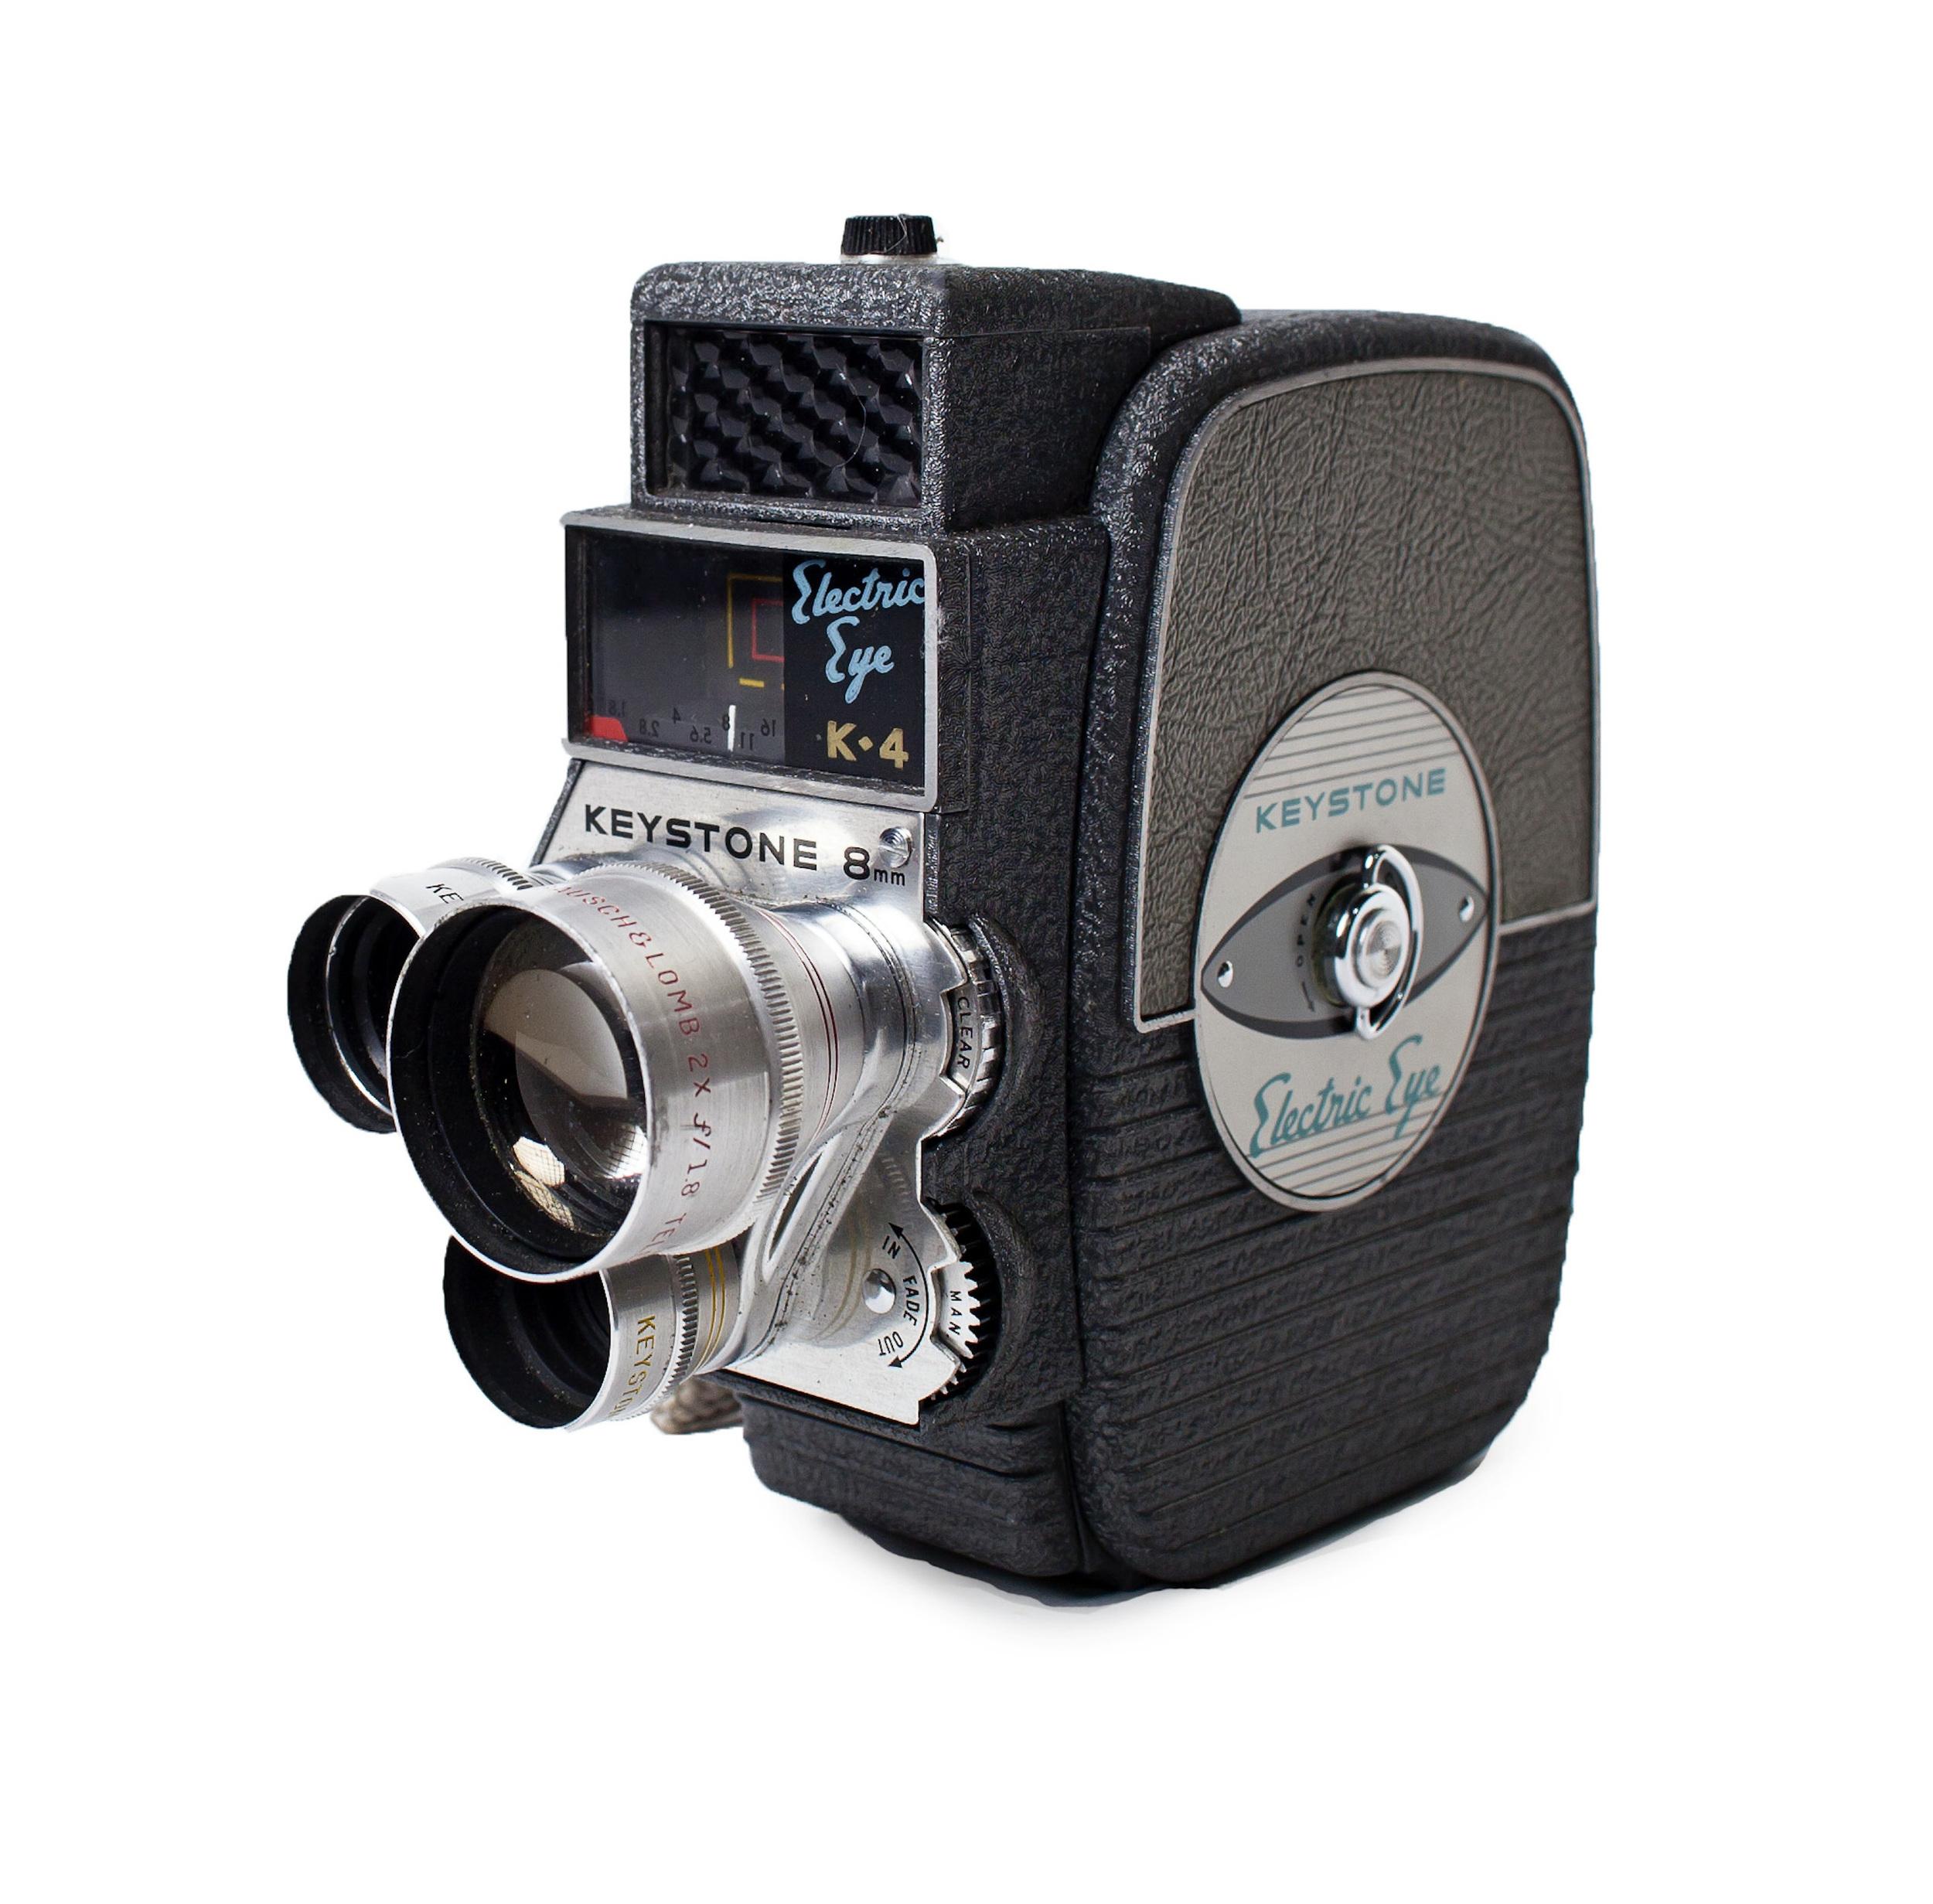 Vintage Video Recorder